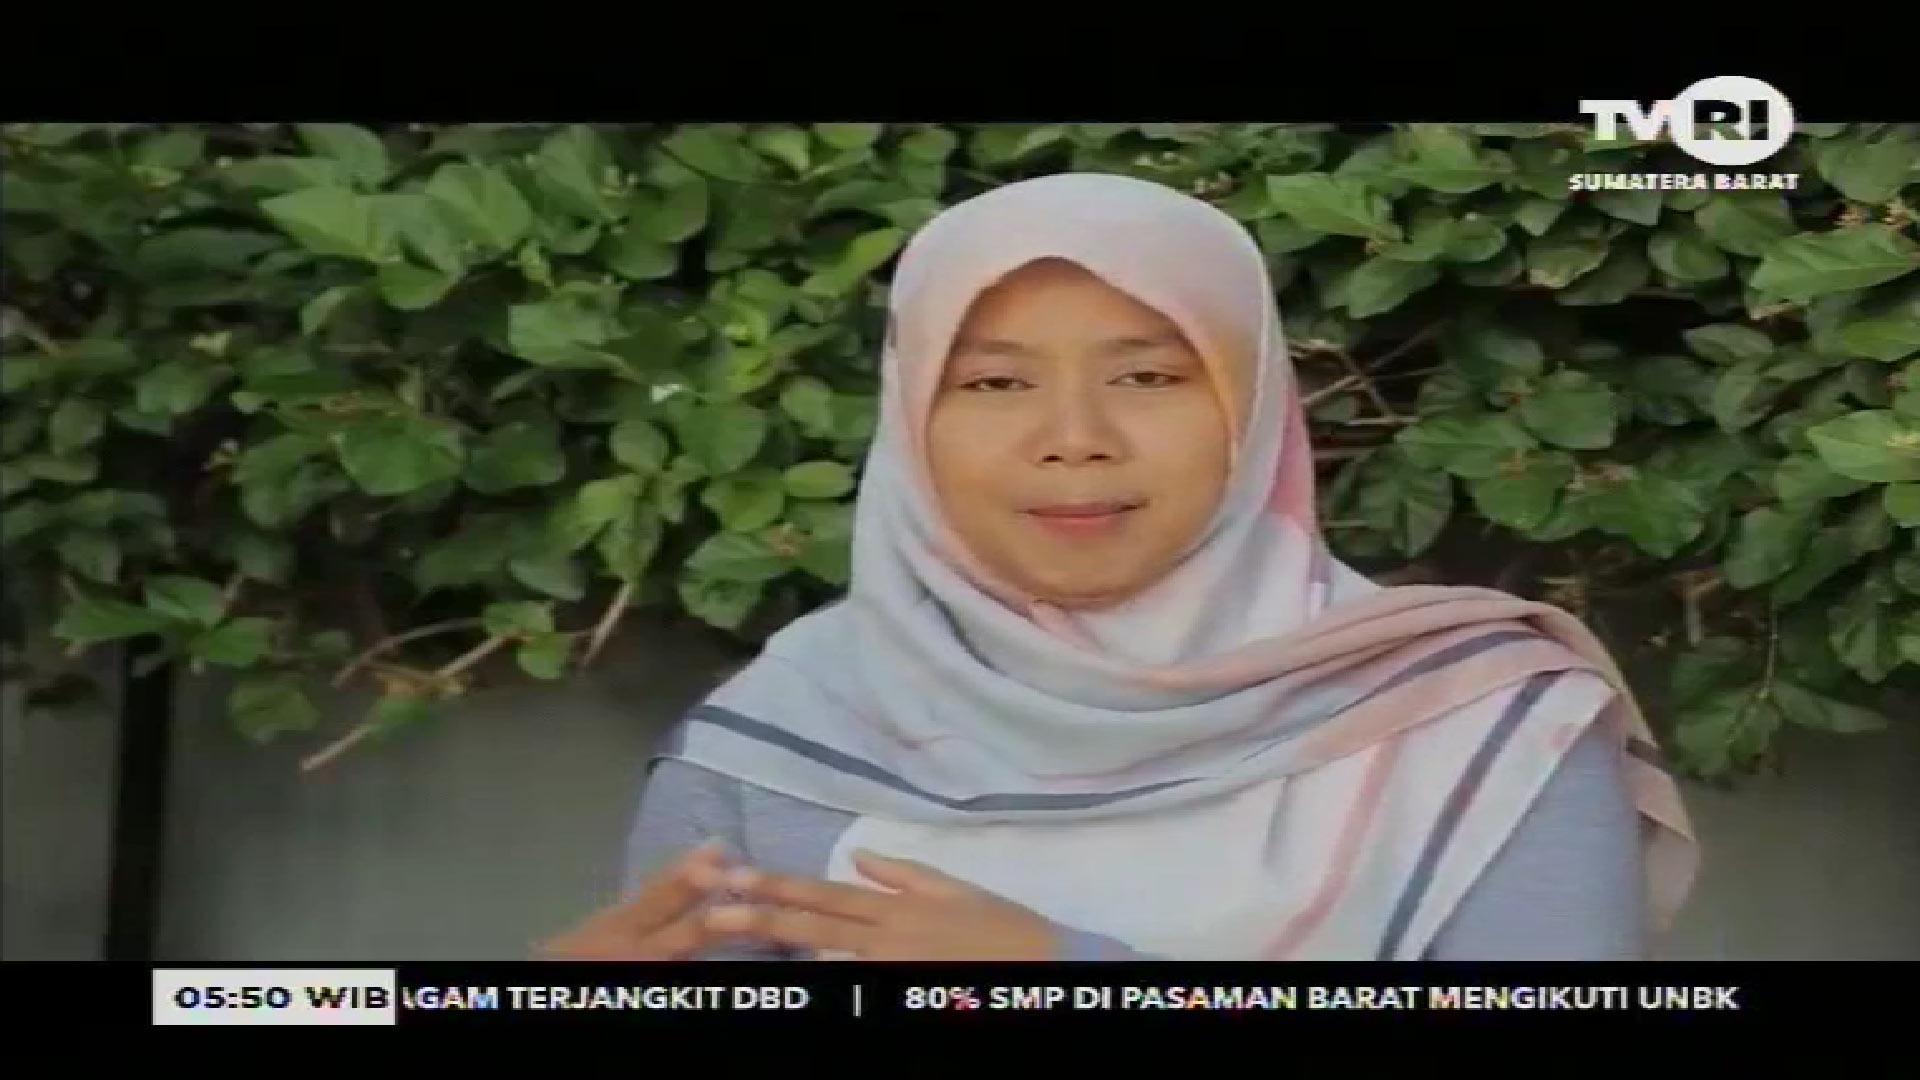 Frekuensi siaran TVRI Sumatera Barat di satelit ChinaSat 11 Terbaru